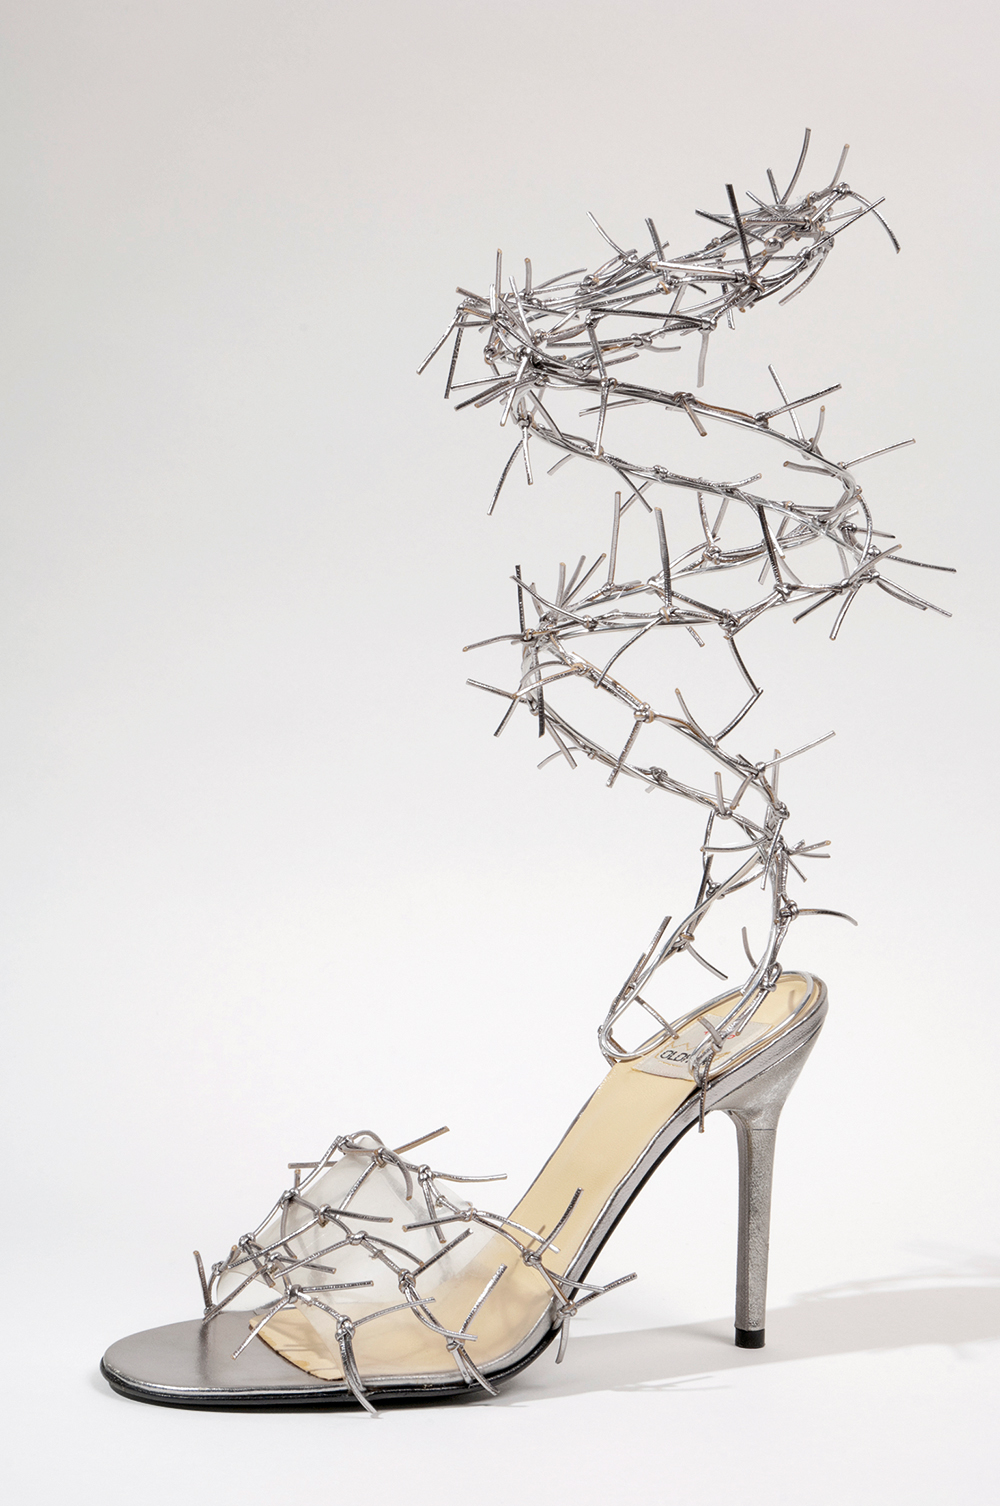 Todd Oldham - cipele od kože metalik srebrne boje i prozirne plastike